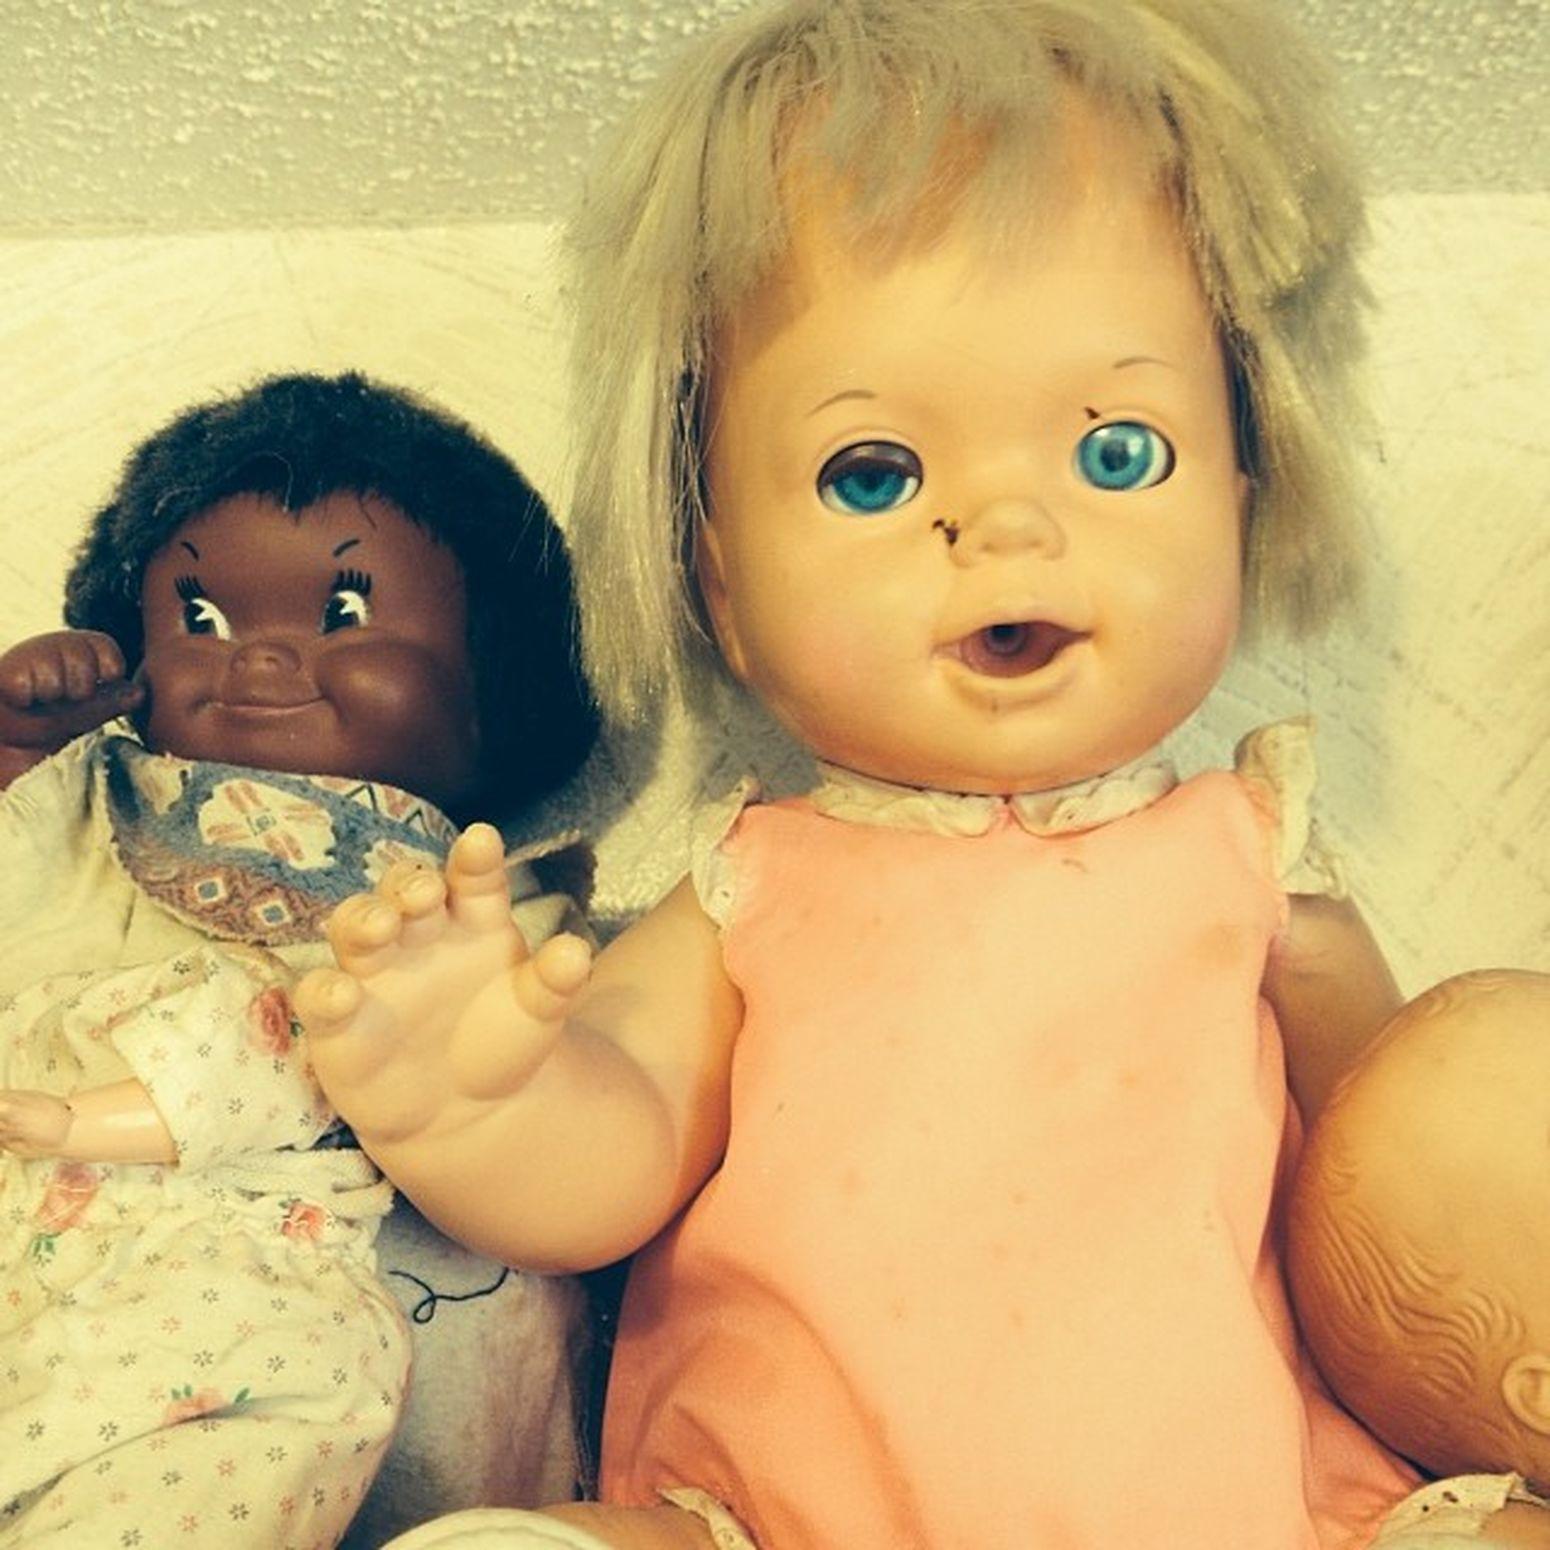 Had these guys watching me work all day. O_o Creepydolls Creepy Annabelledoll Haunted mommy